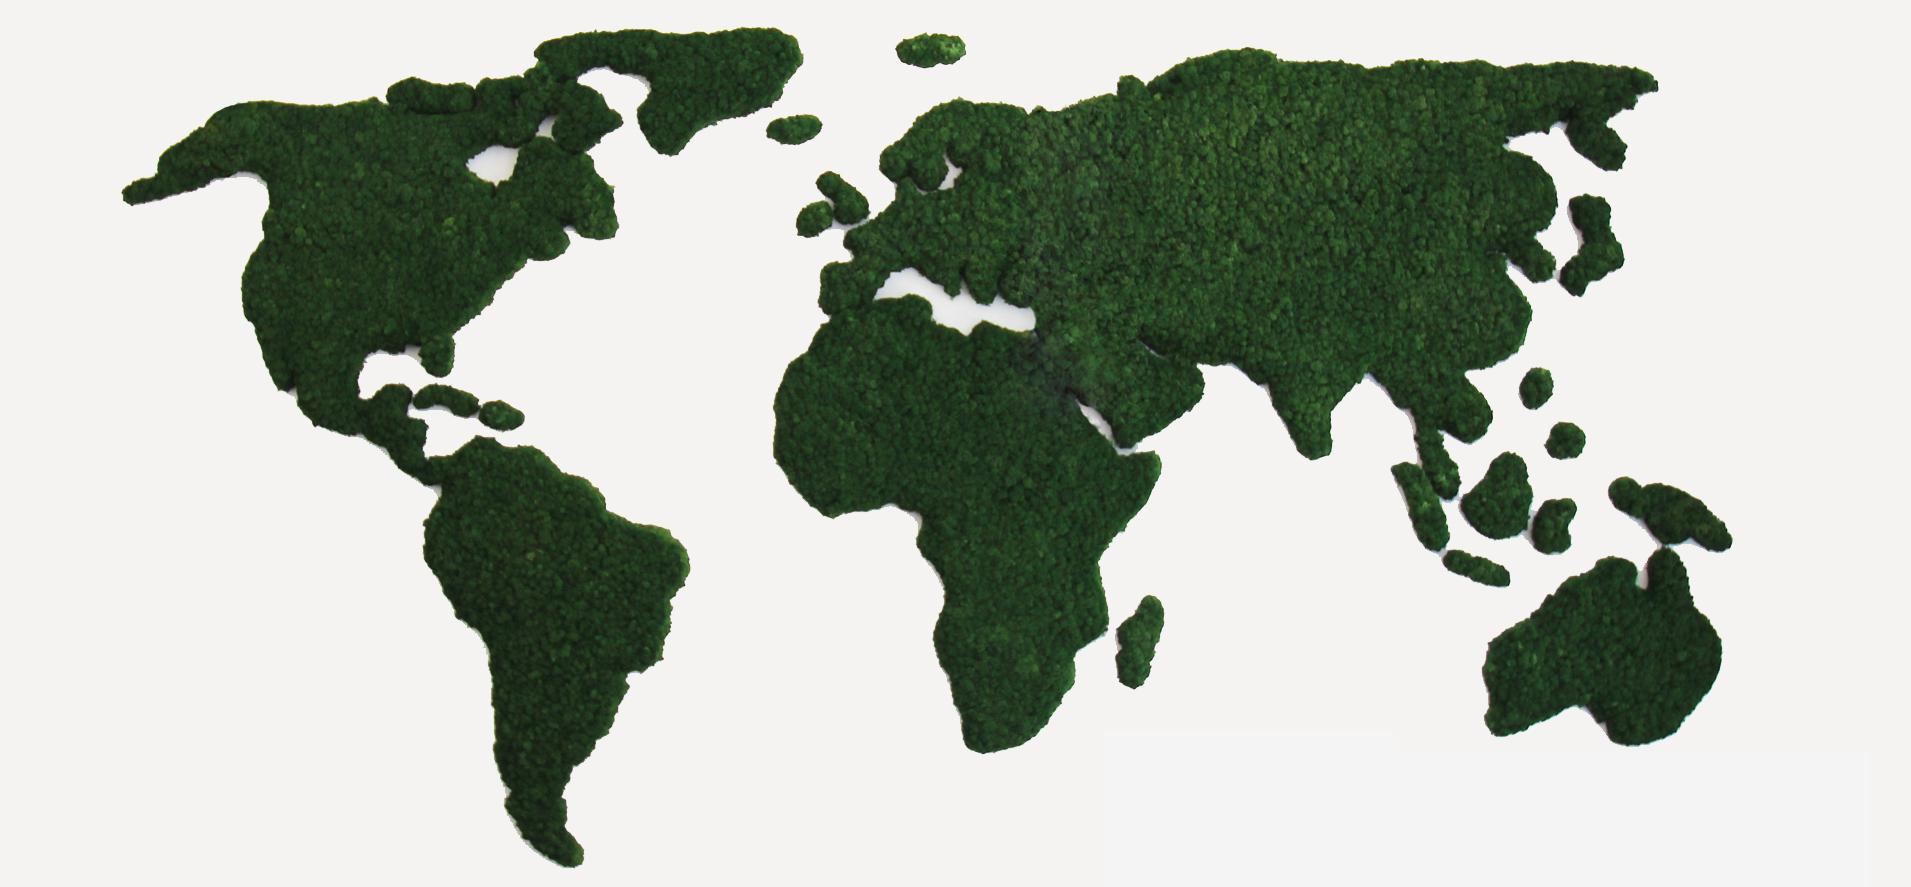 Moss global map.jpg